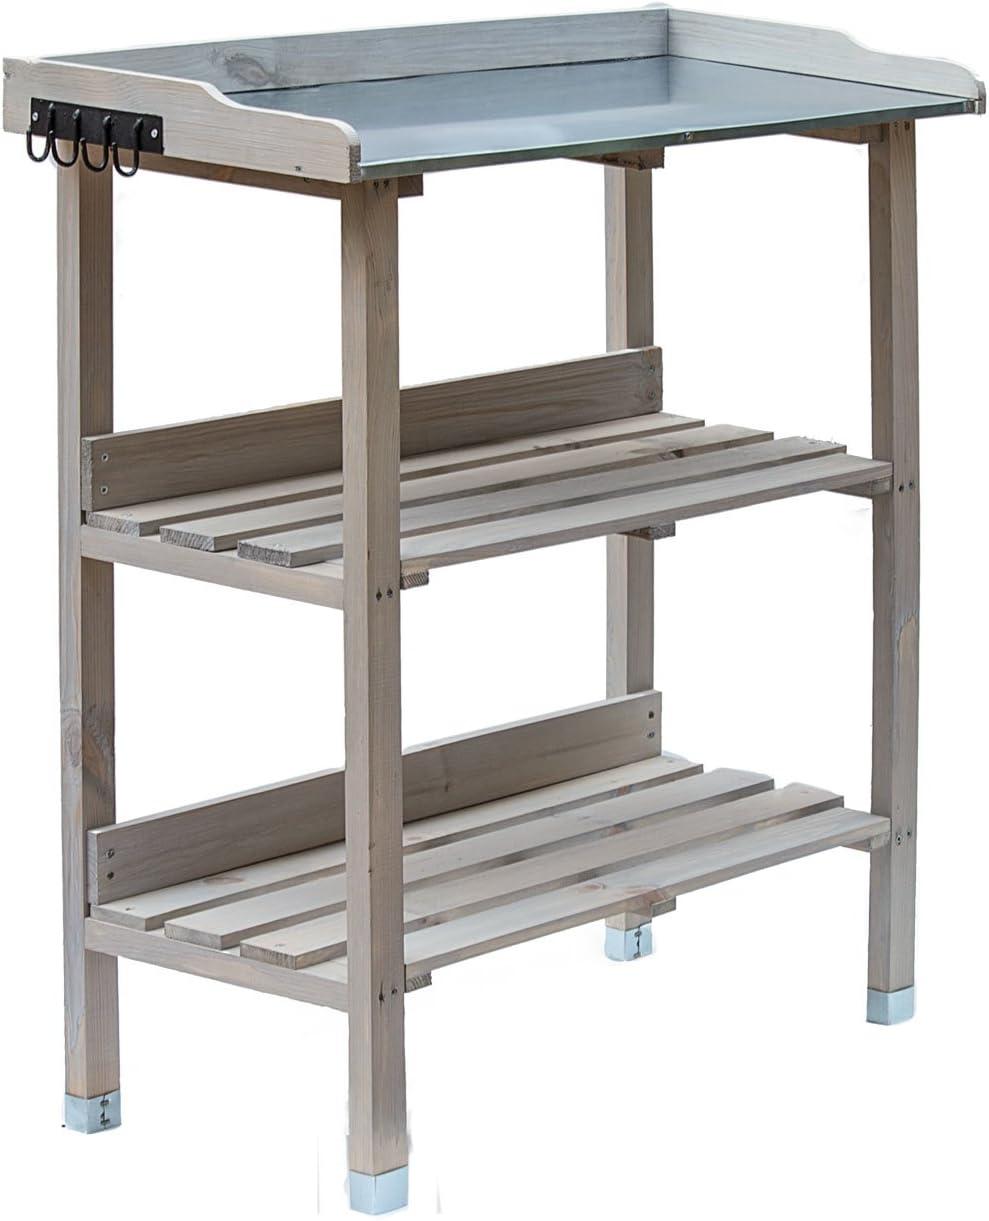 weatherproof patio balcony 2 shelves garden table with zinc plate RM design plant rack. wooden planting table 76 x 38 x 91 cm for garden